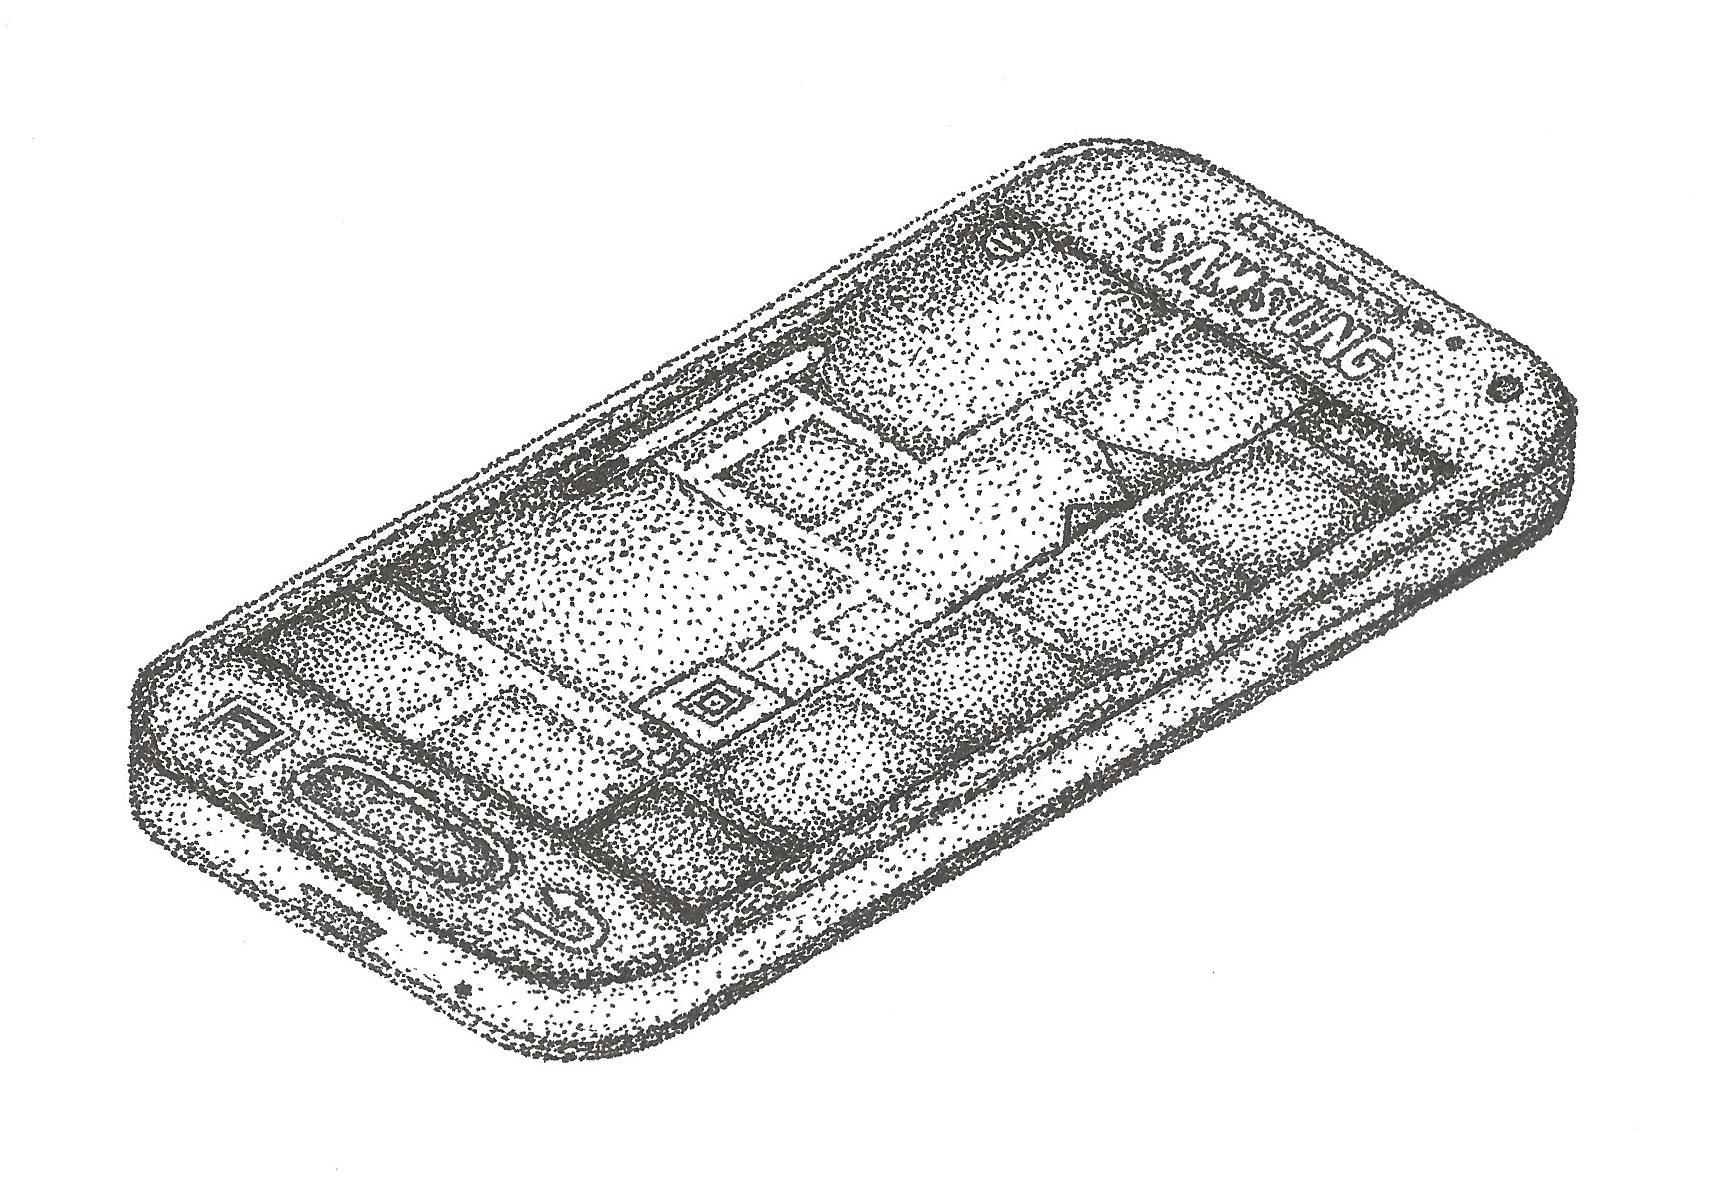 Phone drawn using point